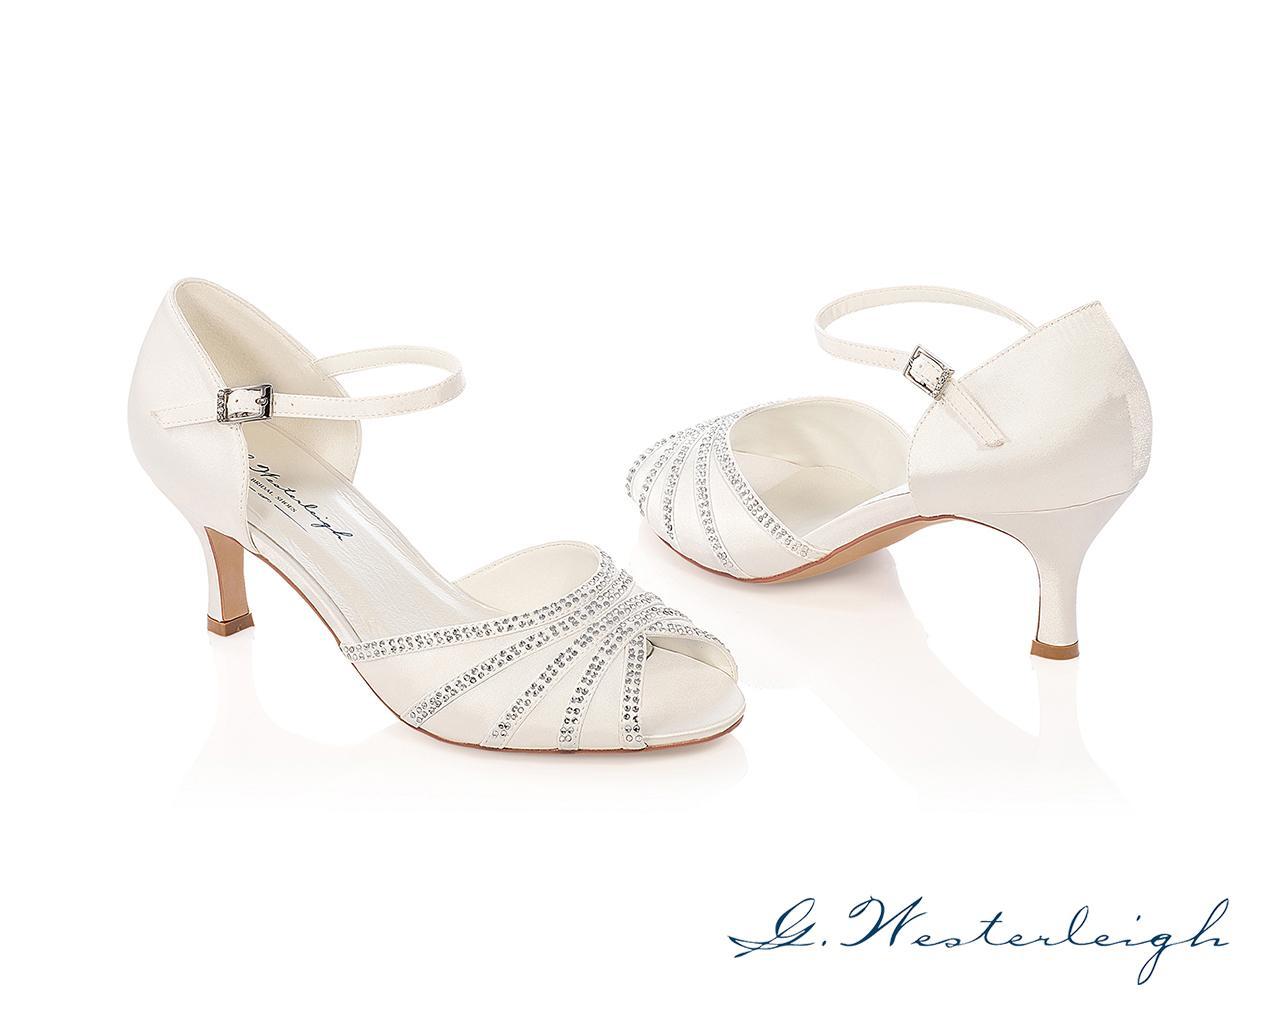 Svadobné topánky Jessica - Obrázok č. 1